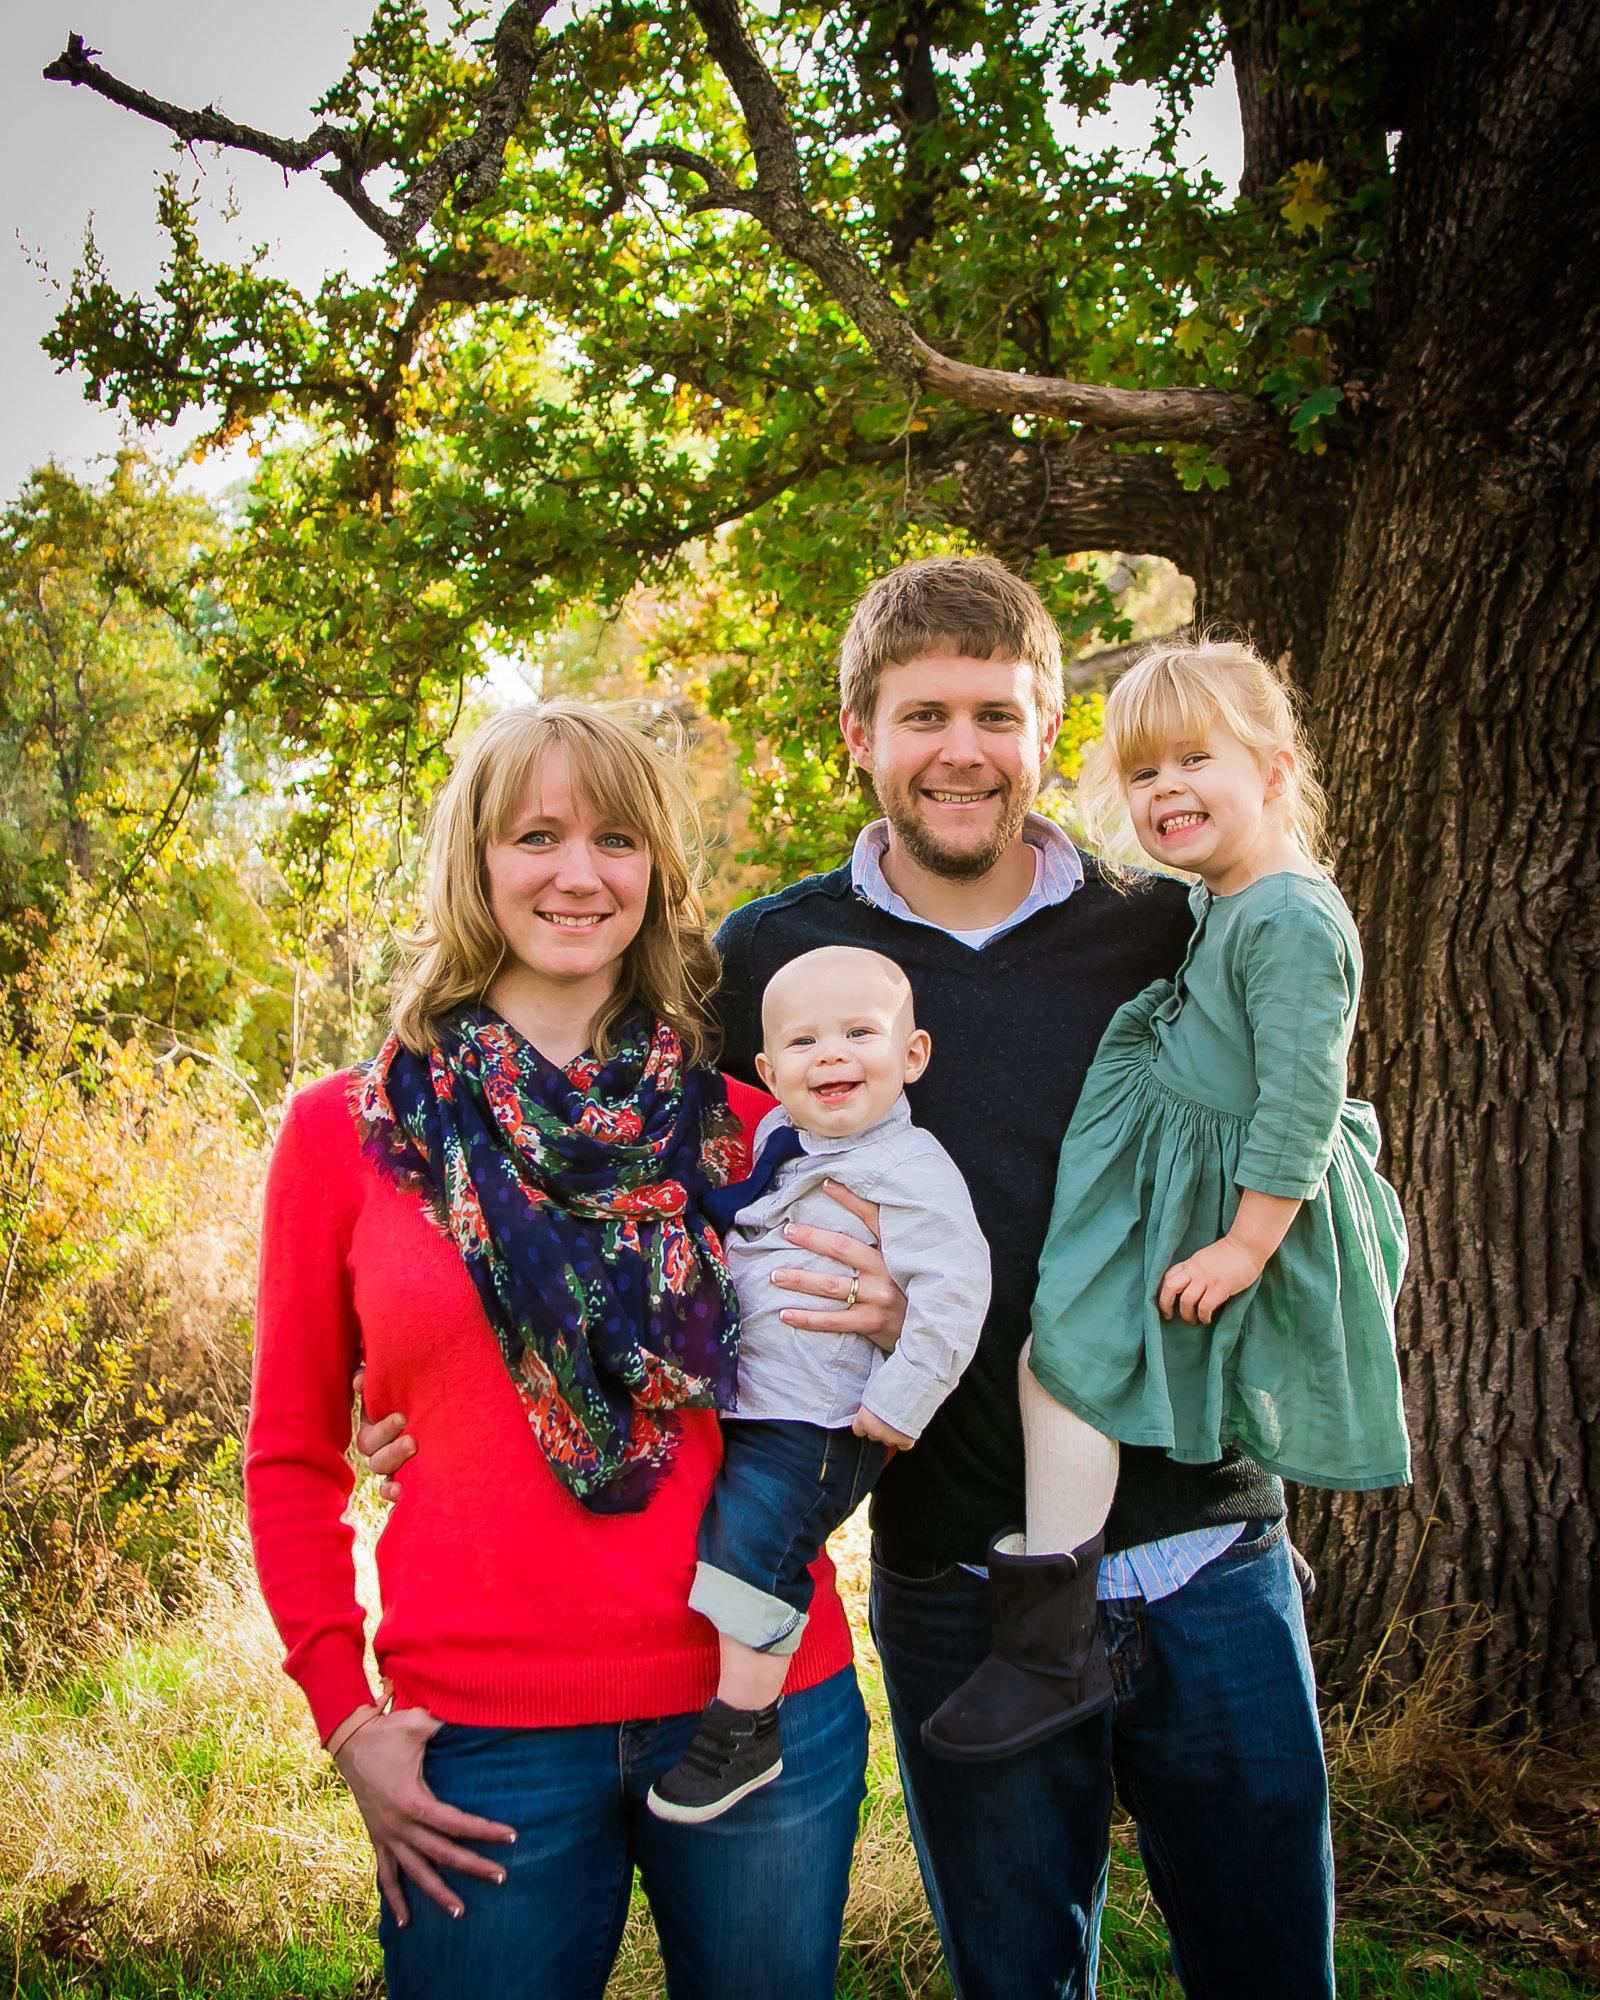 Families_Haight Family, 2015-131